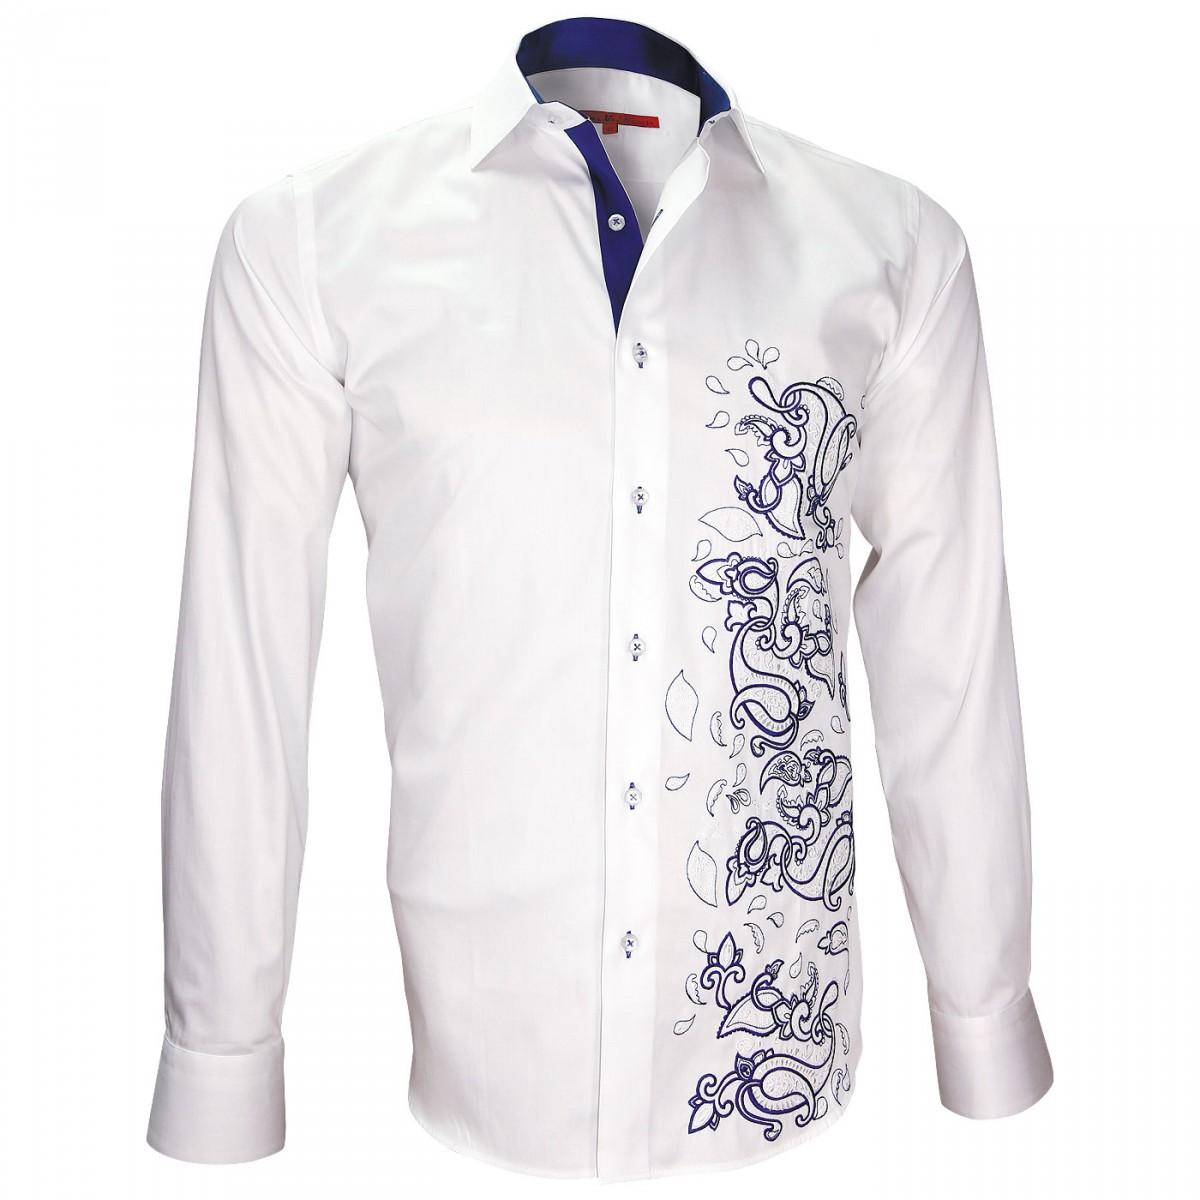 chemise italienne cintree homme,chemise brodee femme,chemise